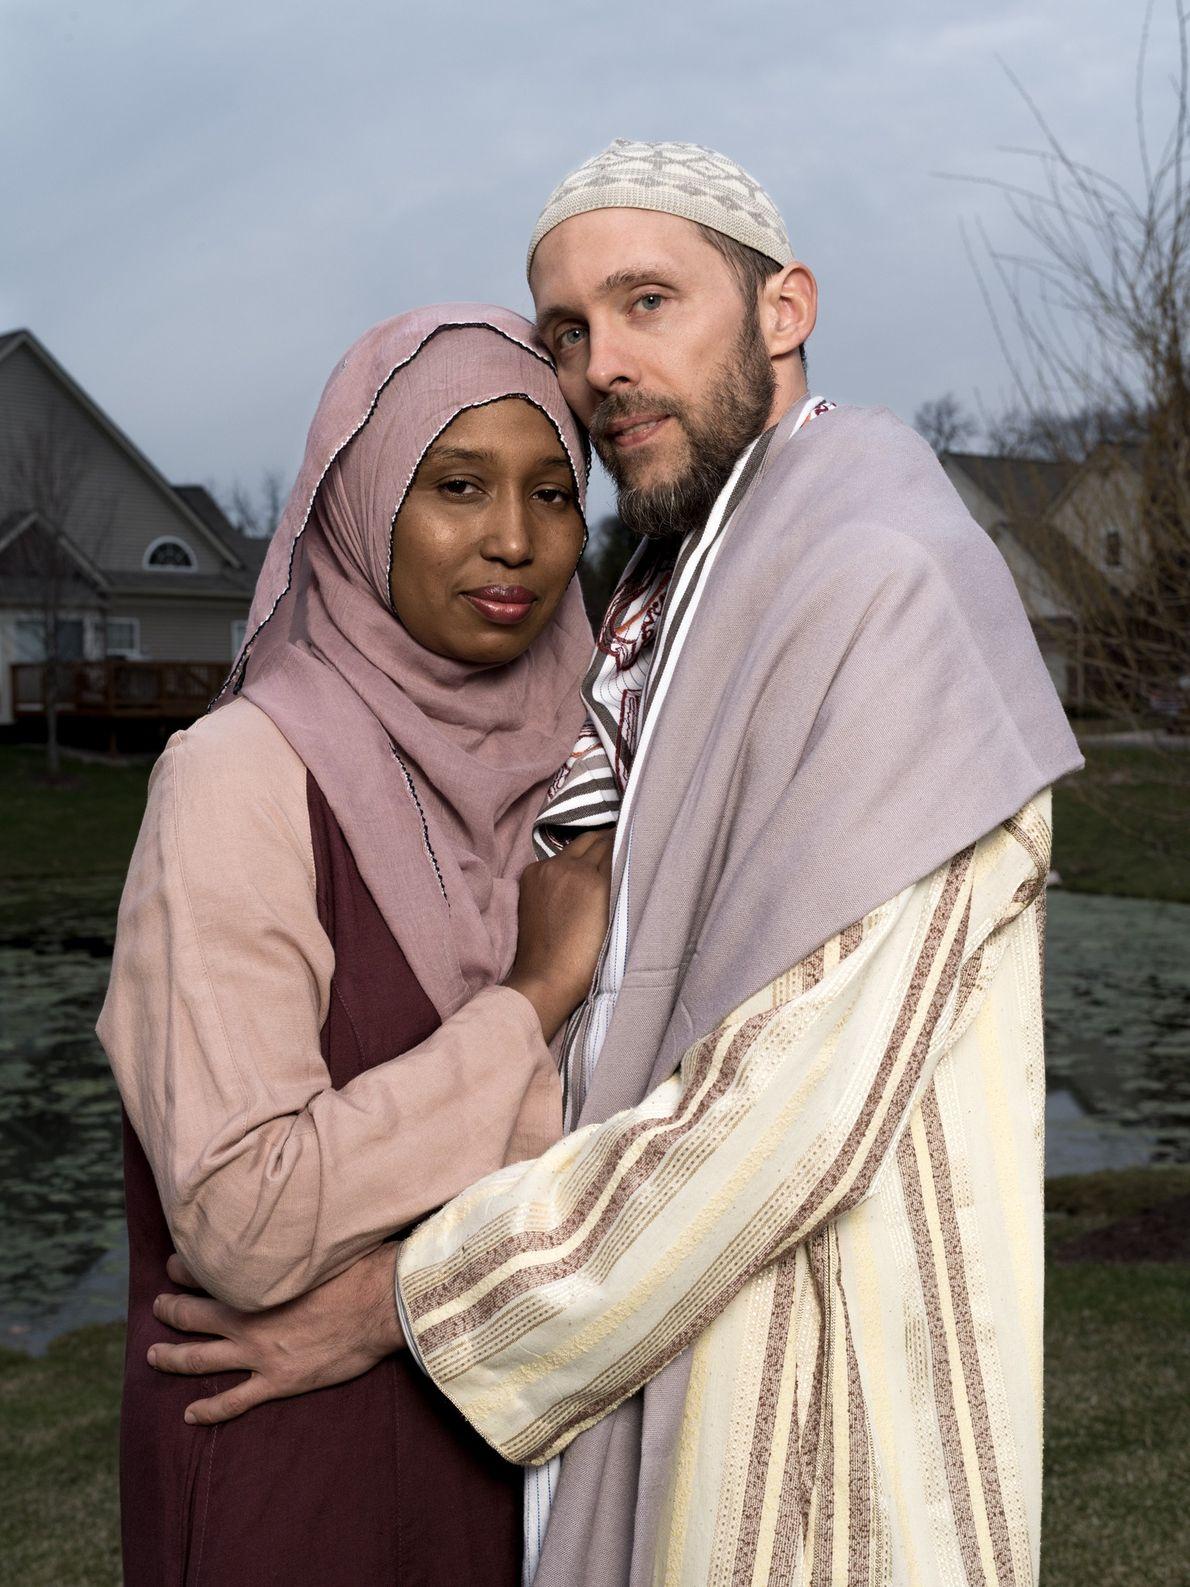 Kamilah Munirah Bolling e Adil Justin Cole junto à sua casa em Farmington Hills, no Michigan. ...